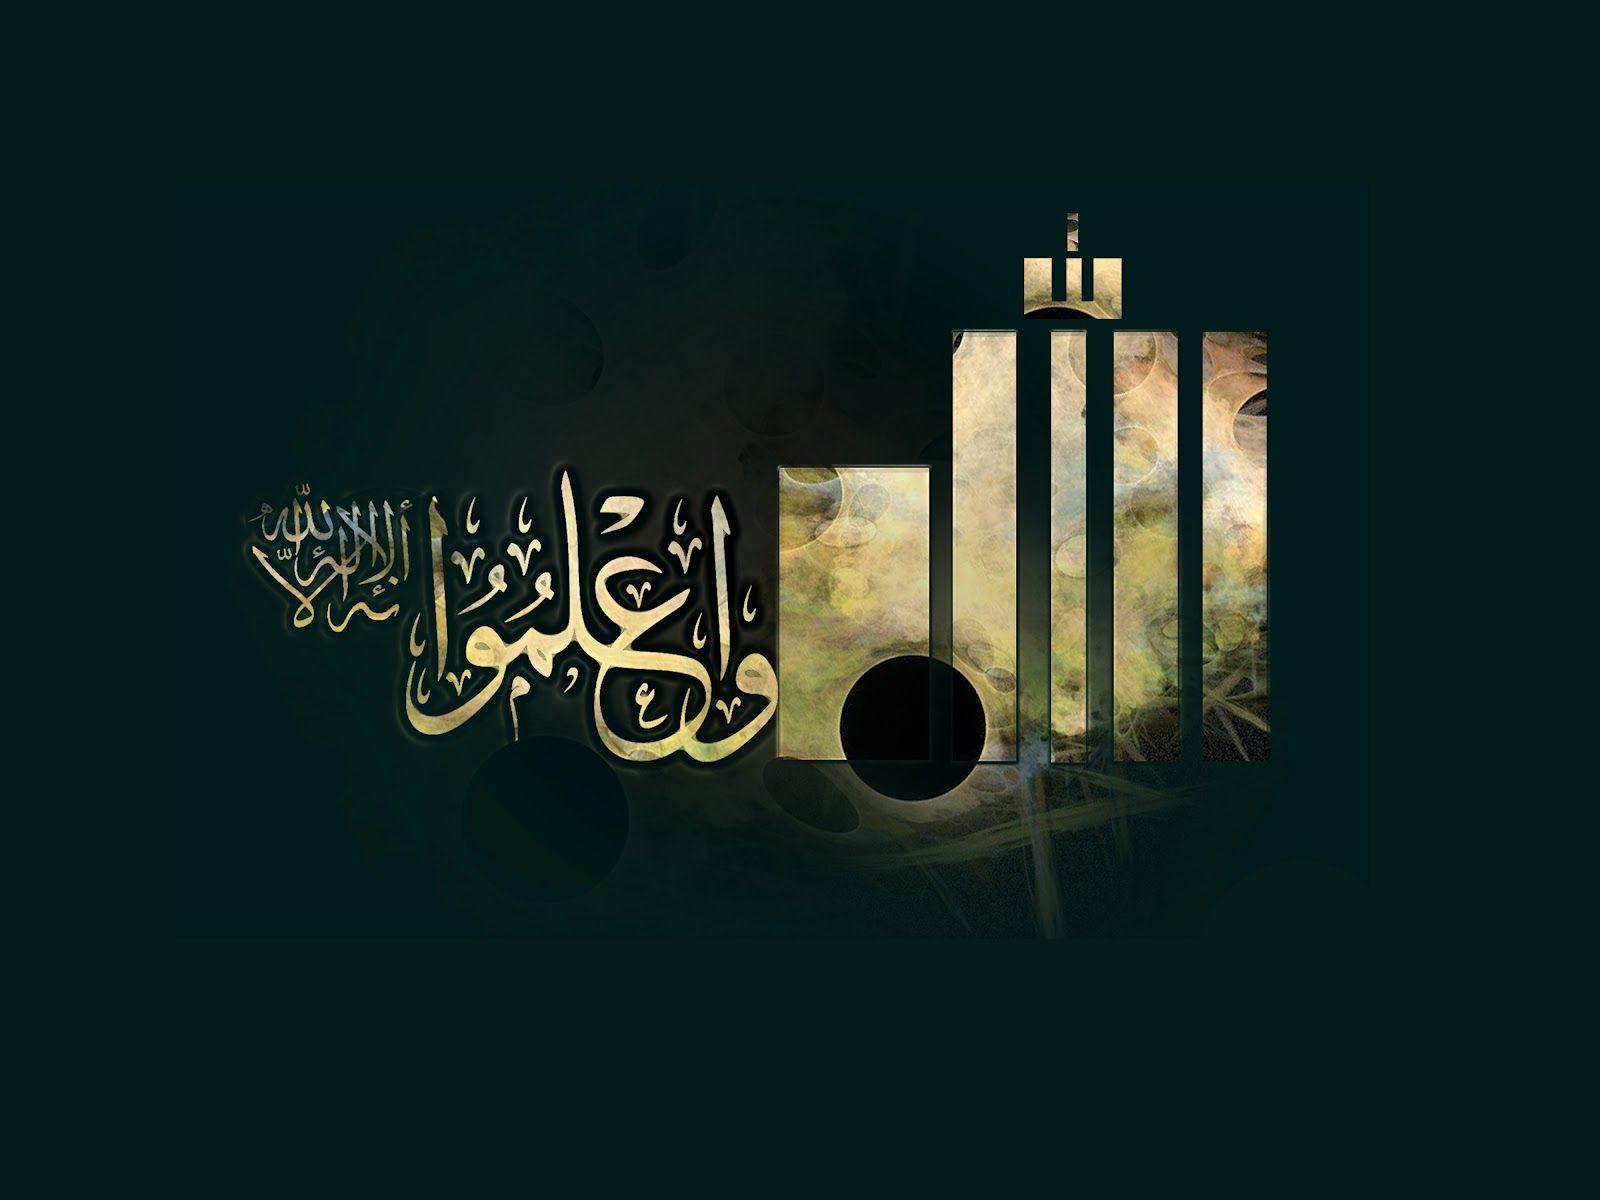 Wallpaper Kaligrafi Allah Kaligrafi Allah Wallpaper Art